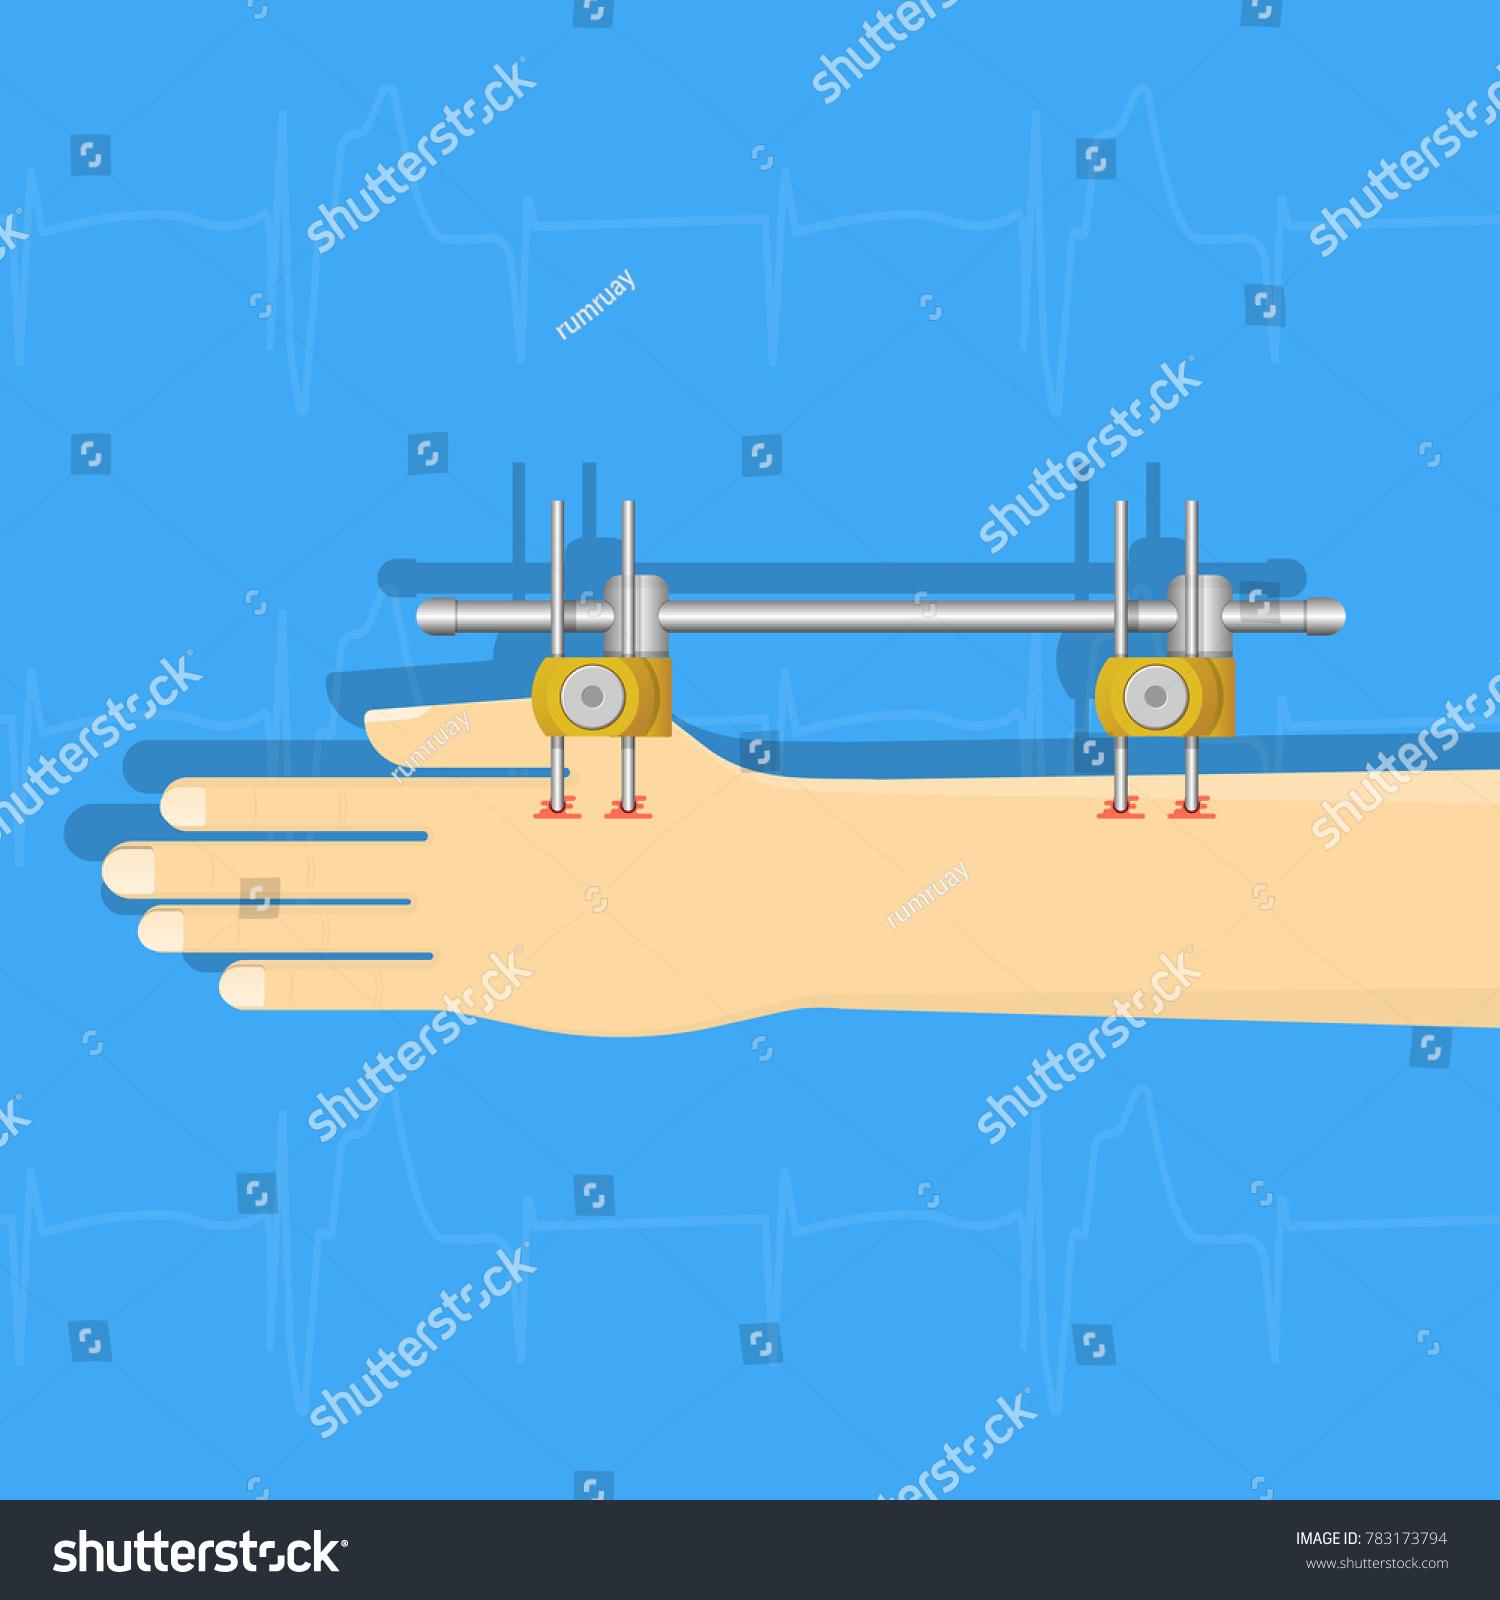 External Fixation Fixator Treatment Broken Bone Stock Vector ...